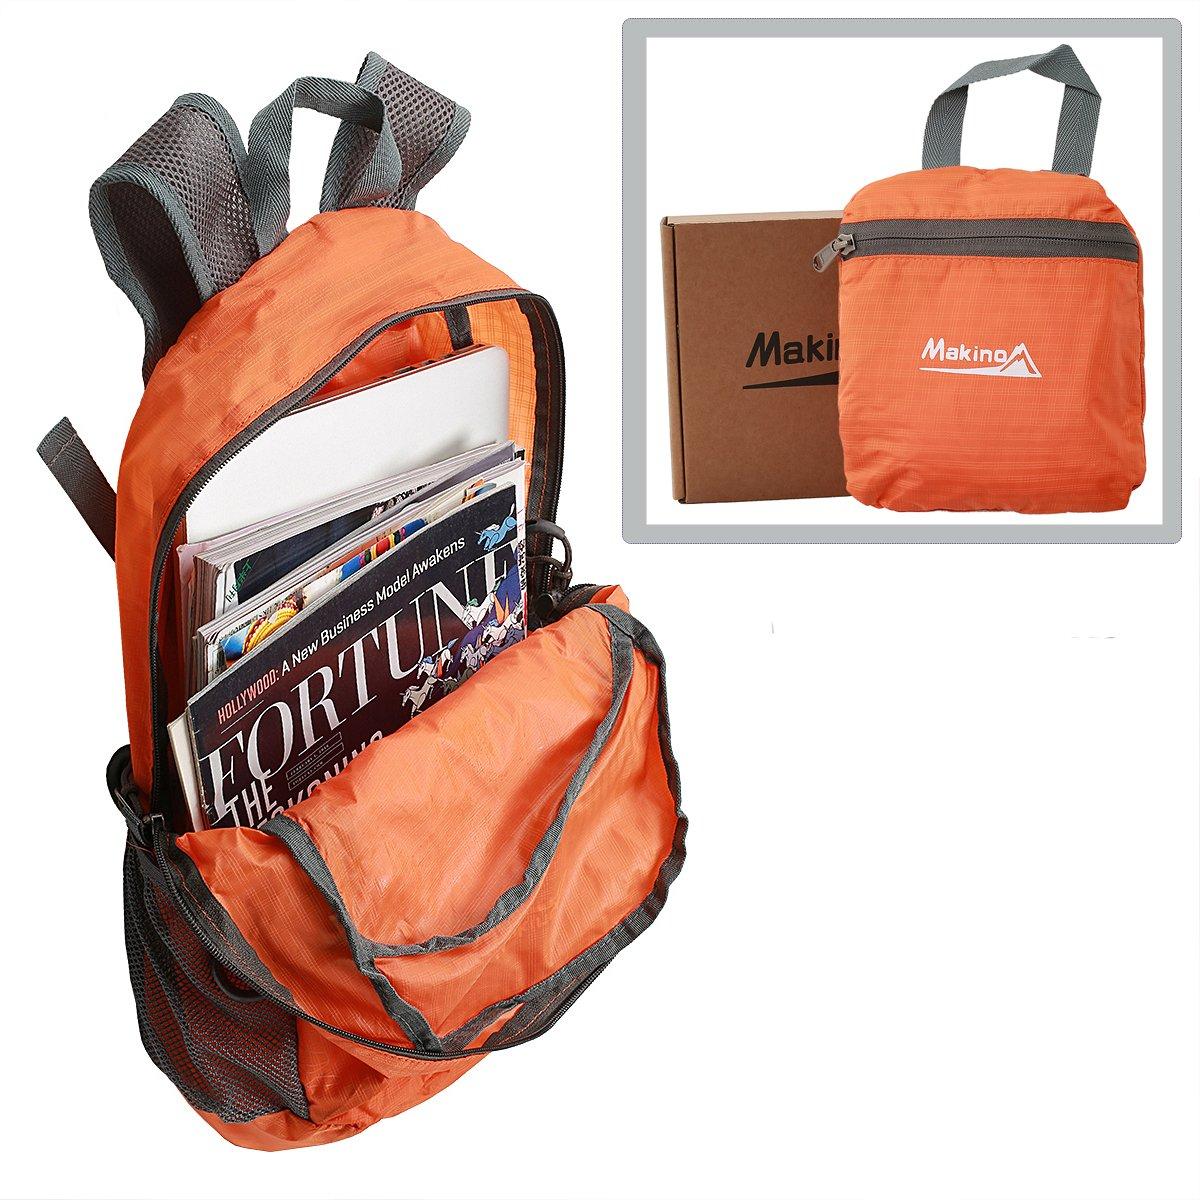 Makino Ultralight Foldable Backpack Hiking Daypack 5504 22 L Orange without Blanket by Makino